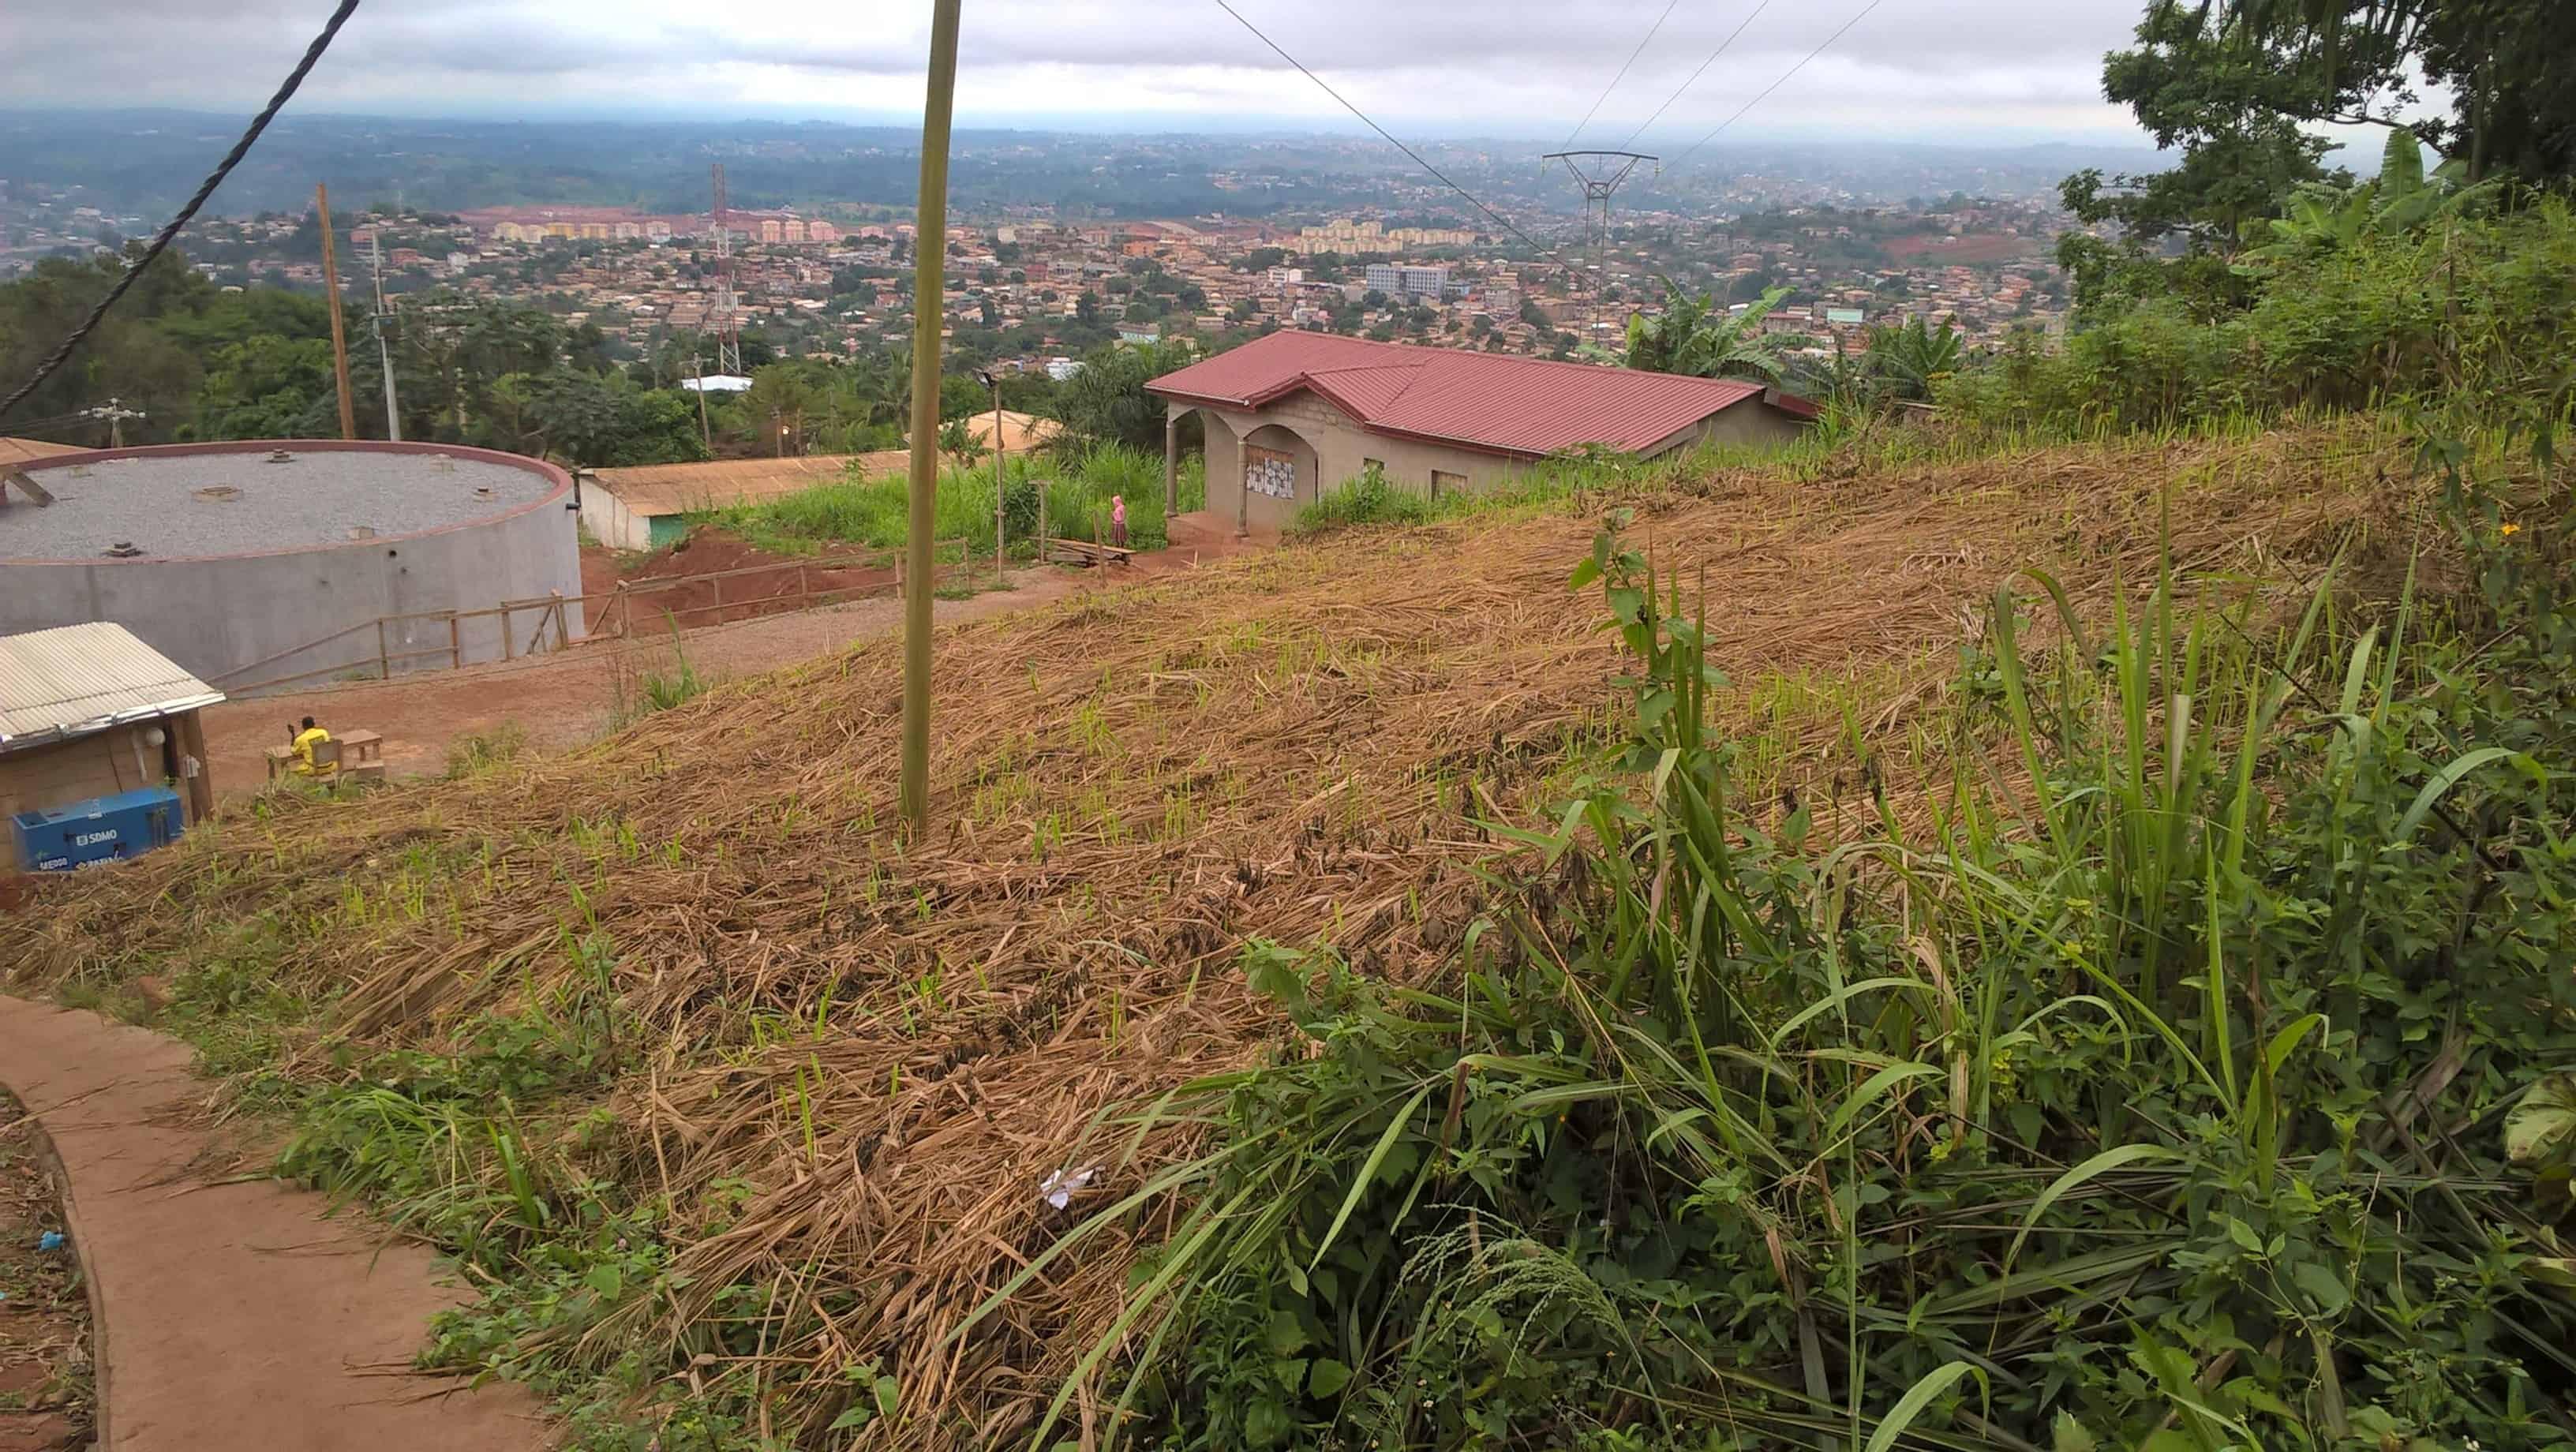 Terrain à vendre - Yaoundé, Messassi, Nkolndobo - 500 m2 - 9 000 000 FCFA